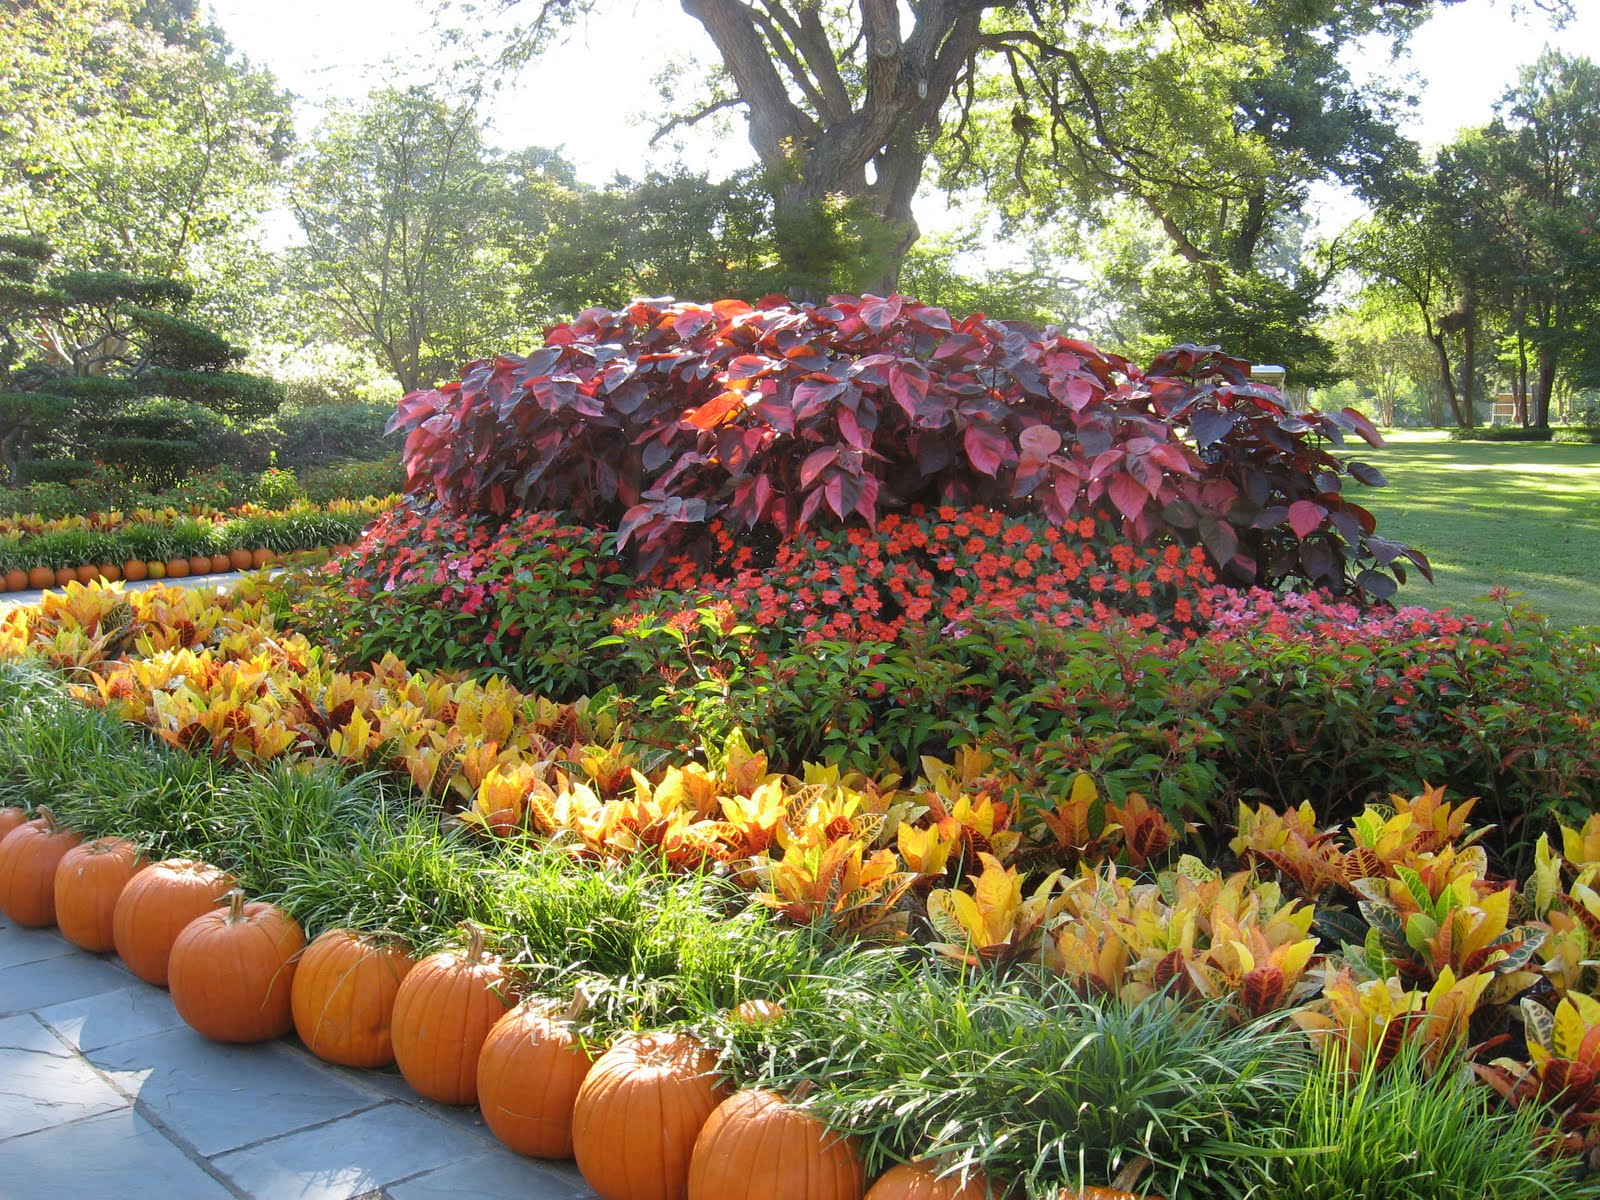 Fall Flowers And Pumpkins Wallpaper The beautiful fall flowers 1600x1200